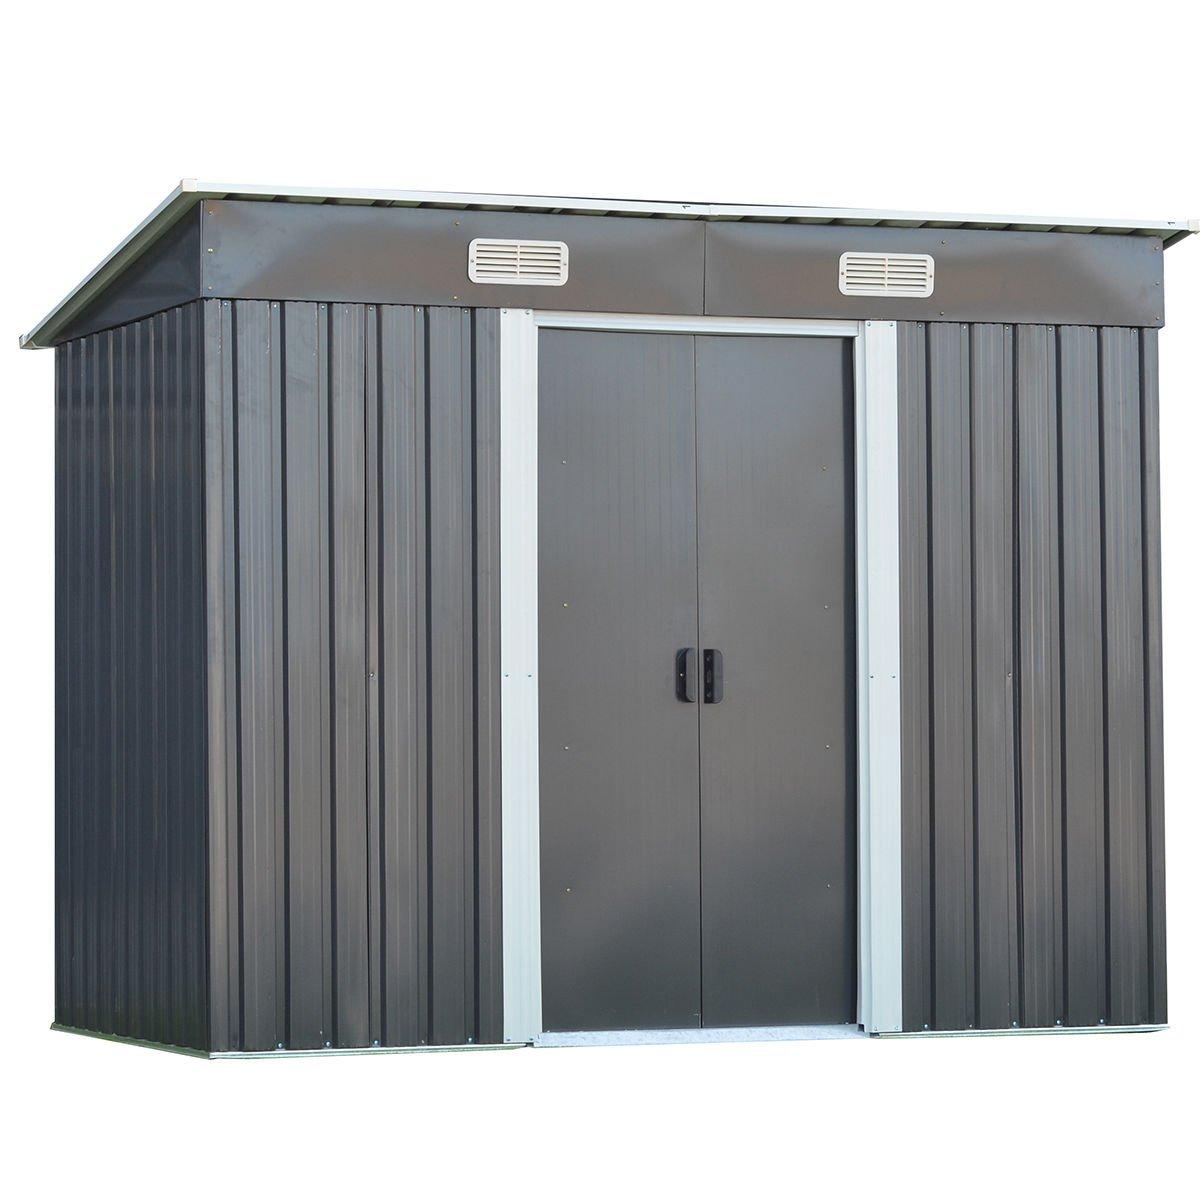 Goplus Galvanized Steel Outdoor Garden Storage Shed 4 x 8 Ft Heavy Duty Tool House W/ Sliding Door (Gray)